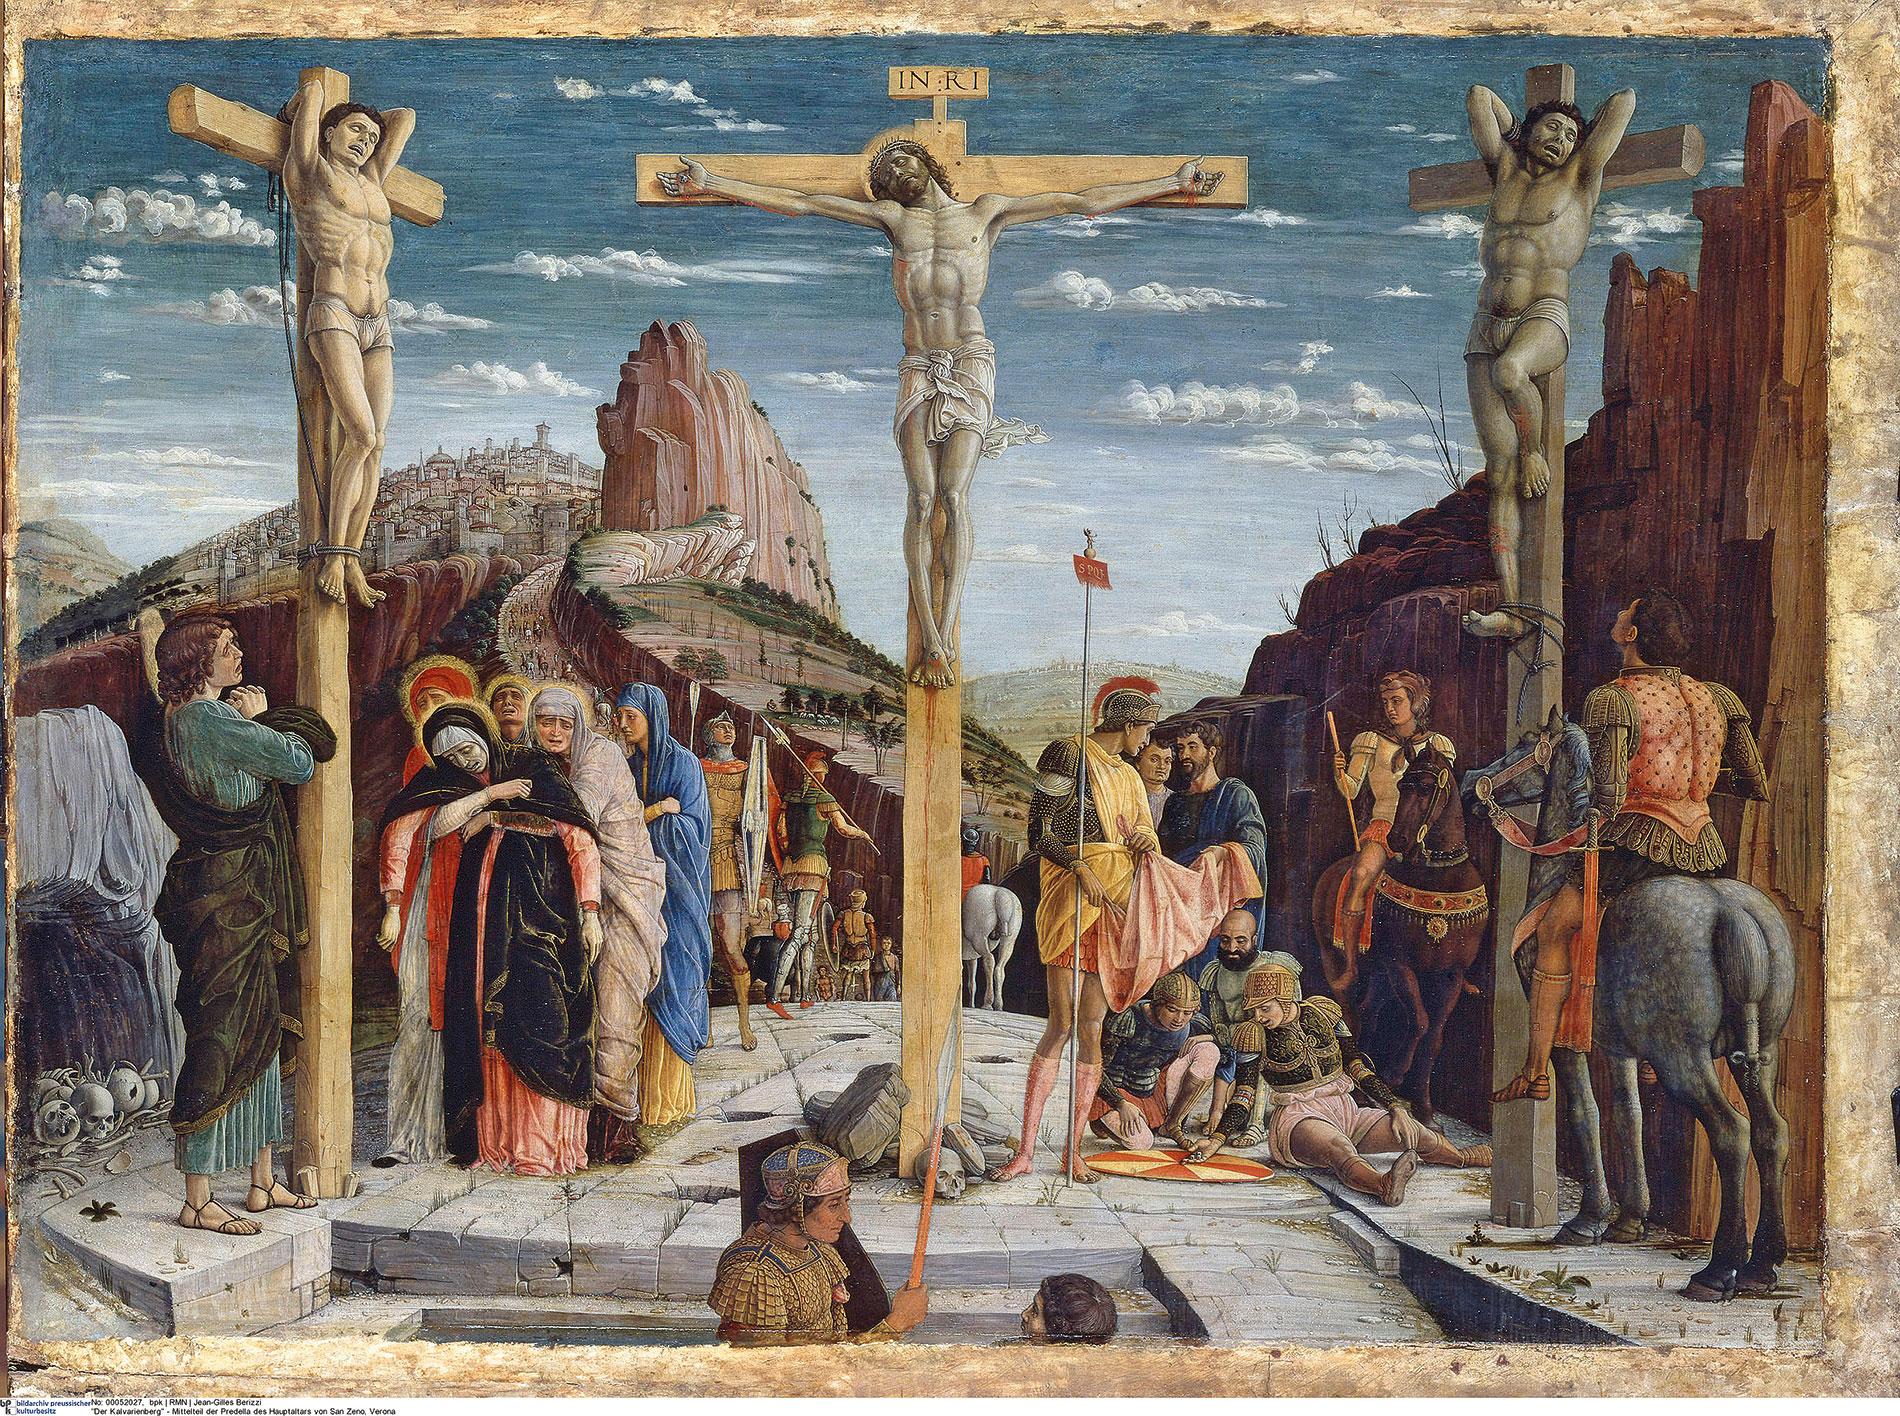 Andrea Mantegna, Kalvarienberg, Mittelteil der Predella des Hauptaltars, 1457/60, 76×96 cm; San Zeno, Verona